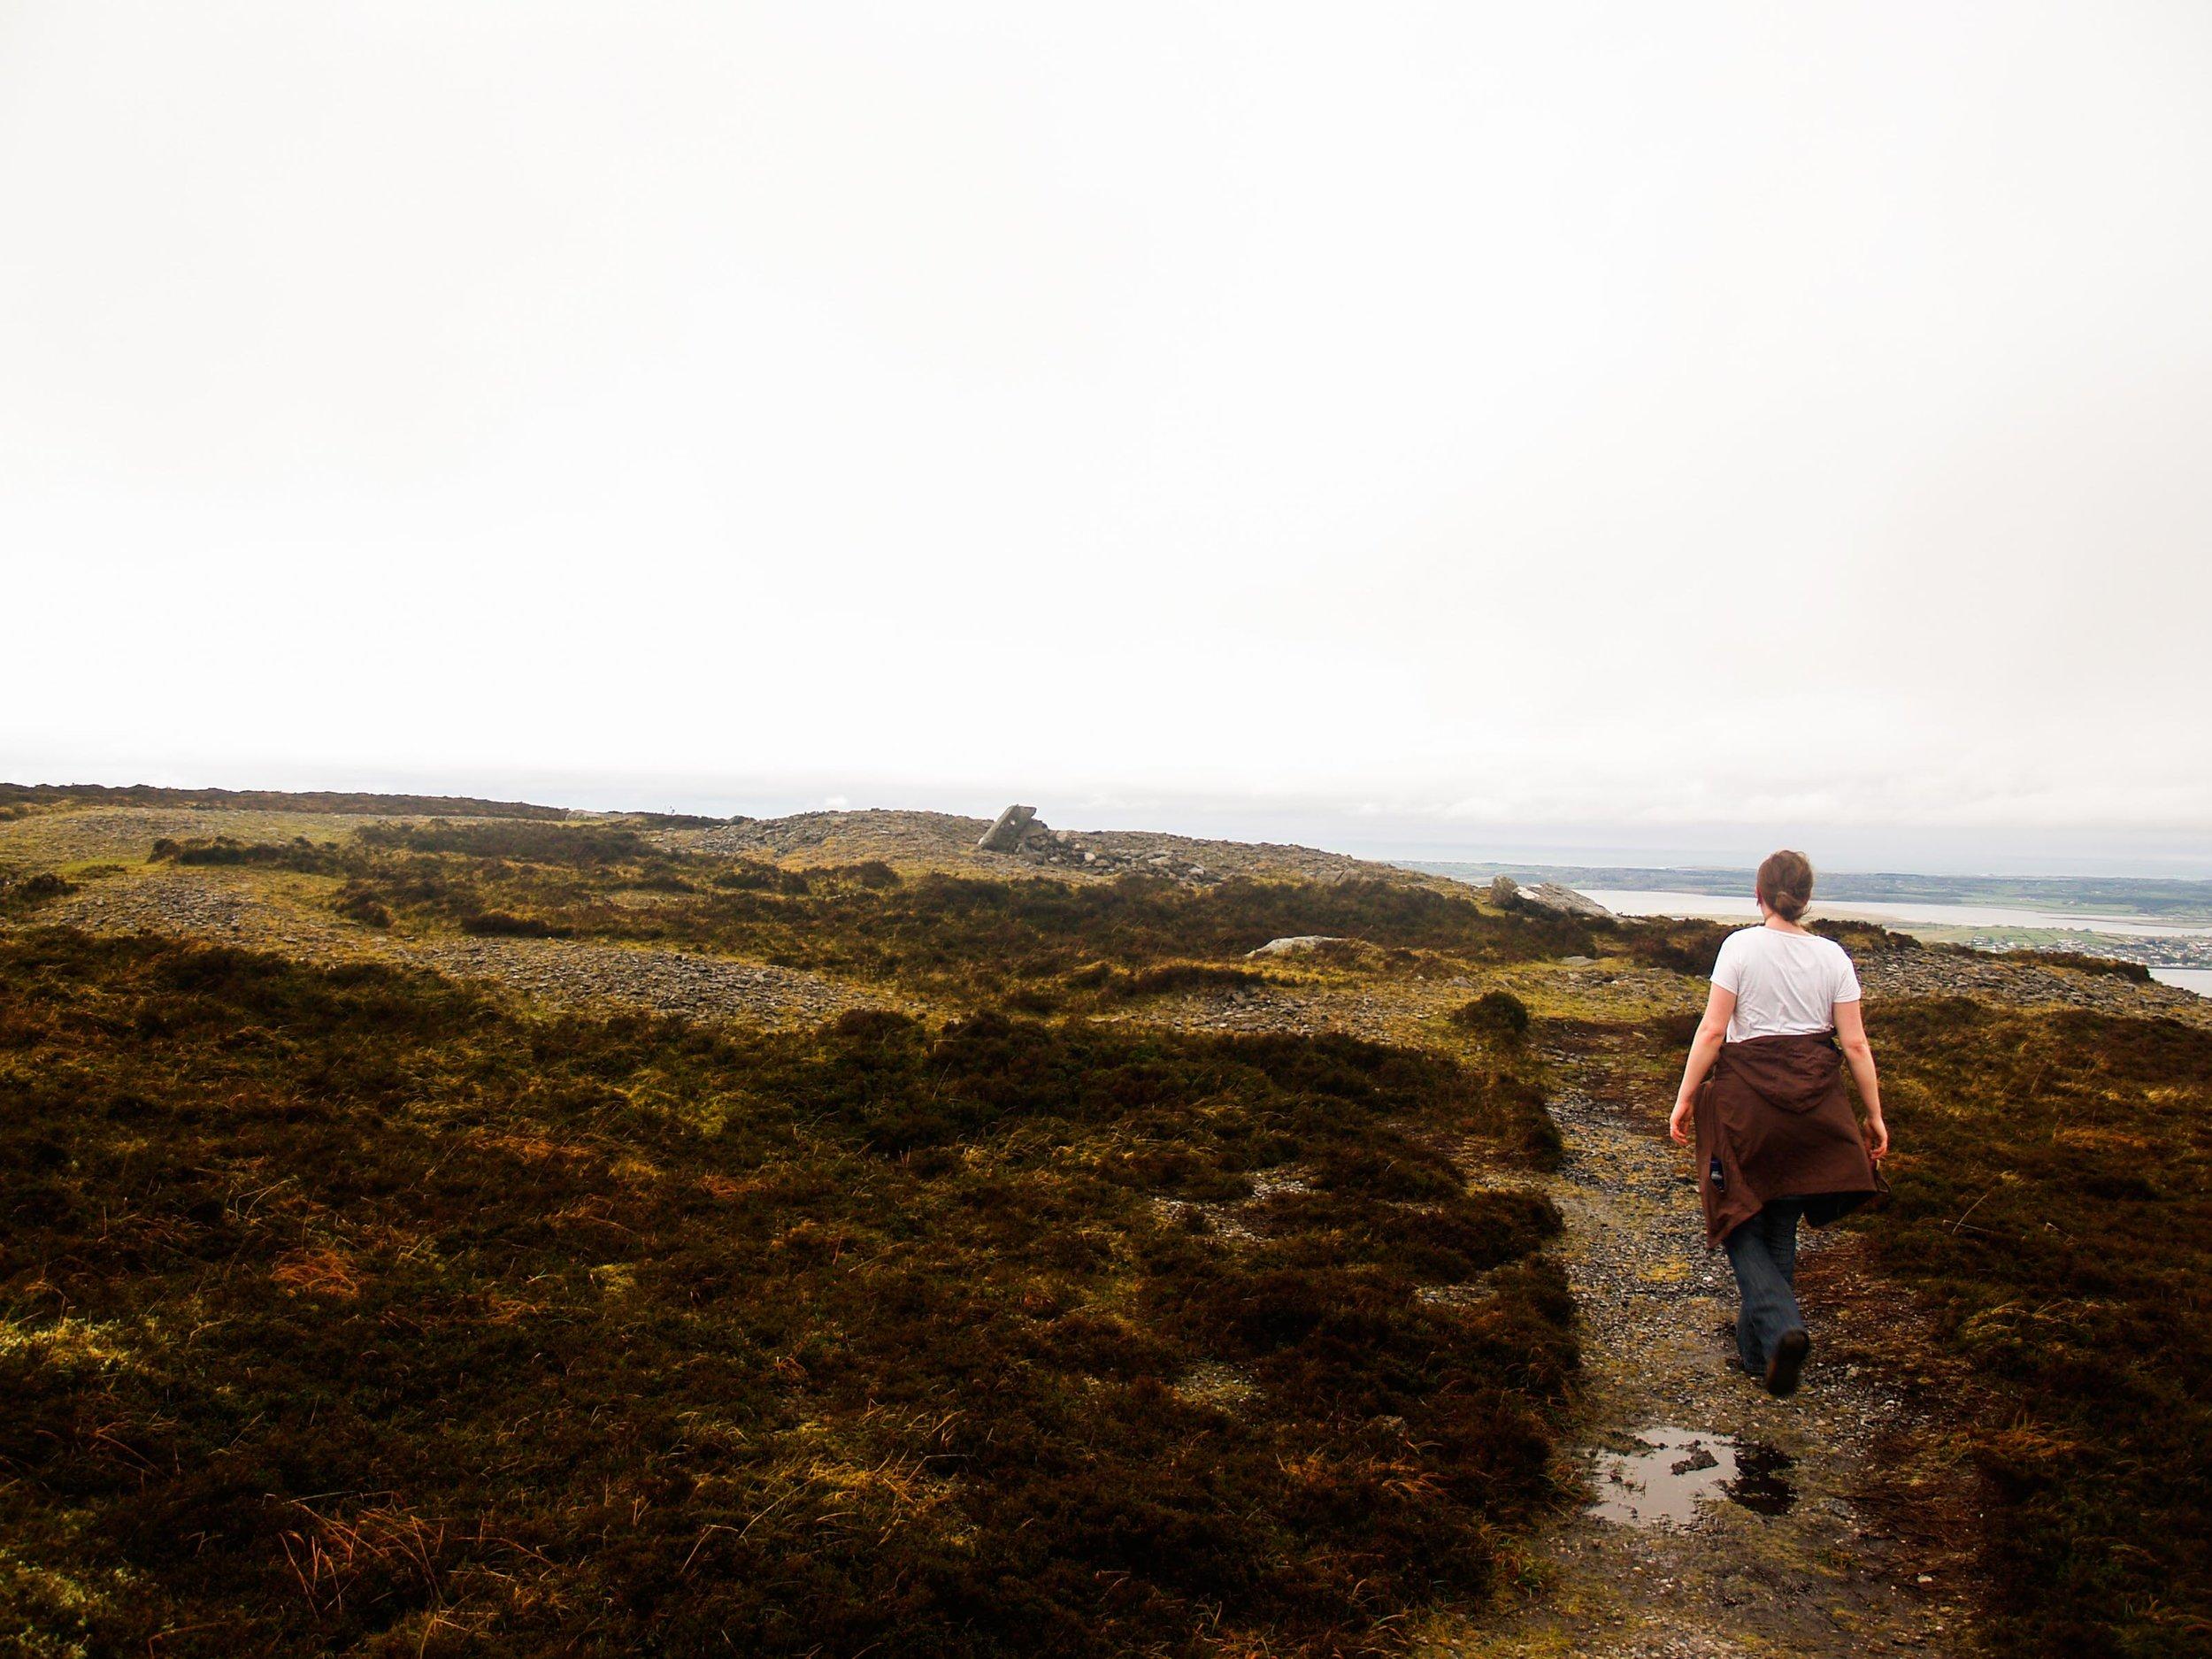 hill walking girl